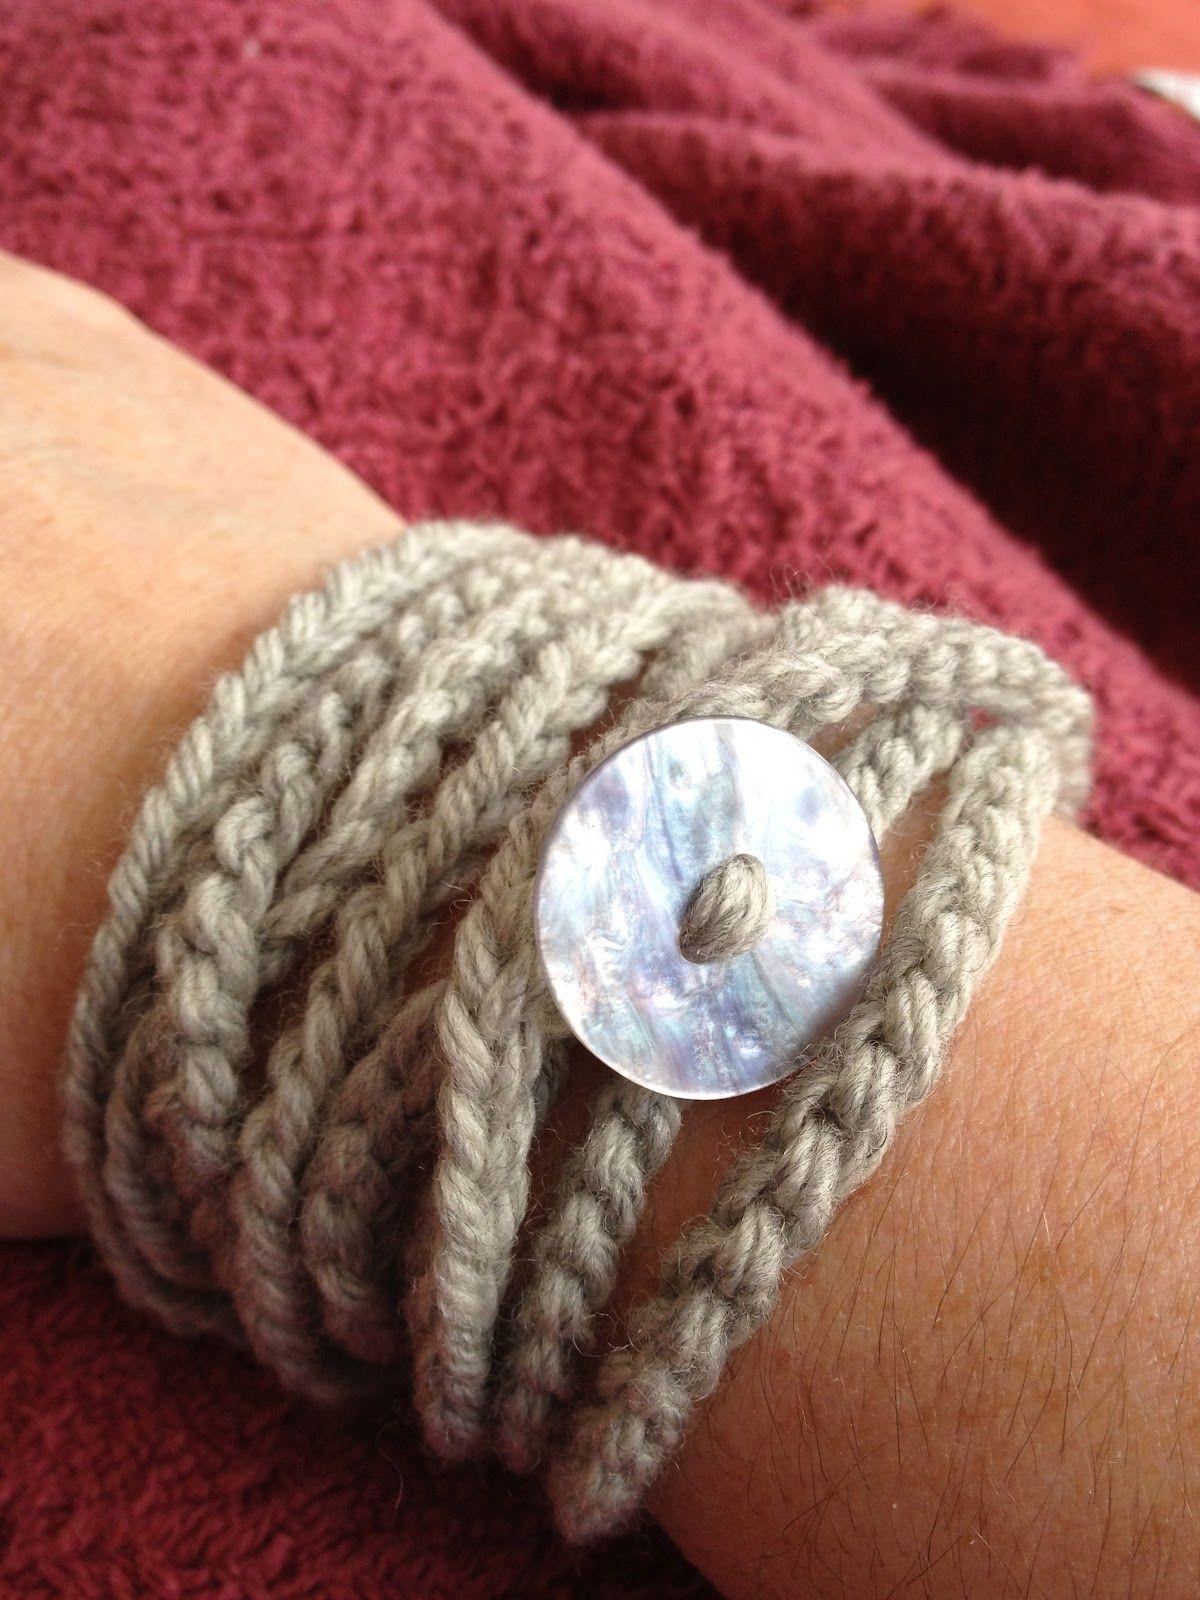 Brownie knits crocheted bracelets free pattern crochet brownie knits crocheted bracelets free pattern bankloansurffo Images